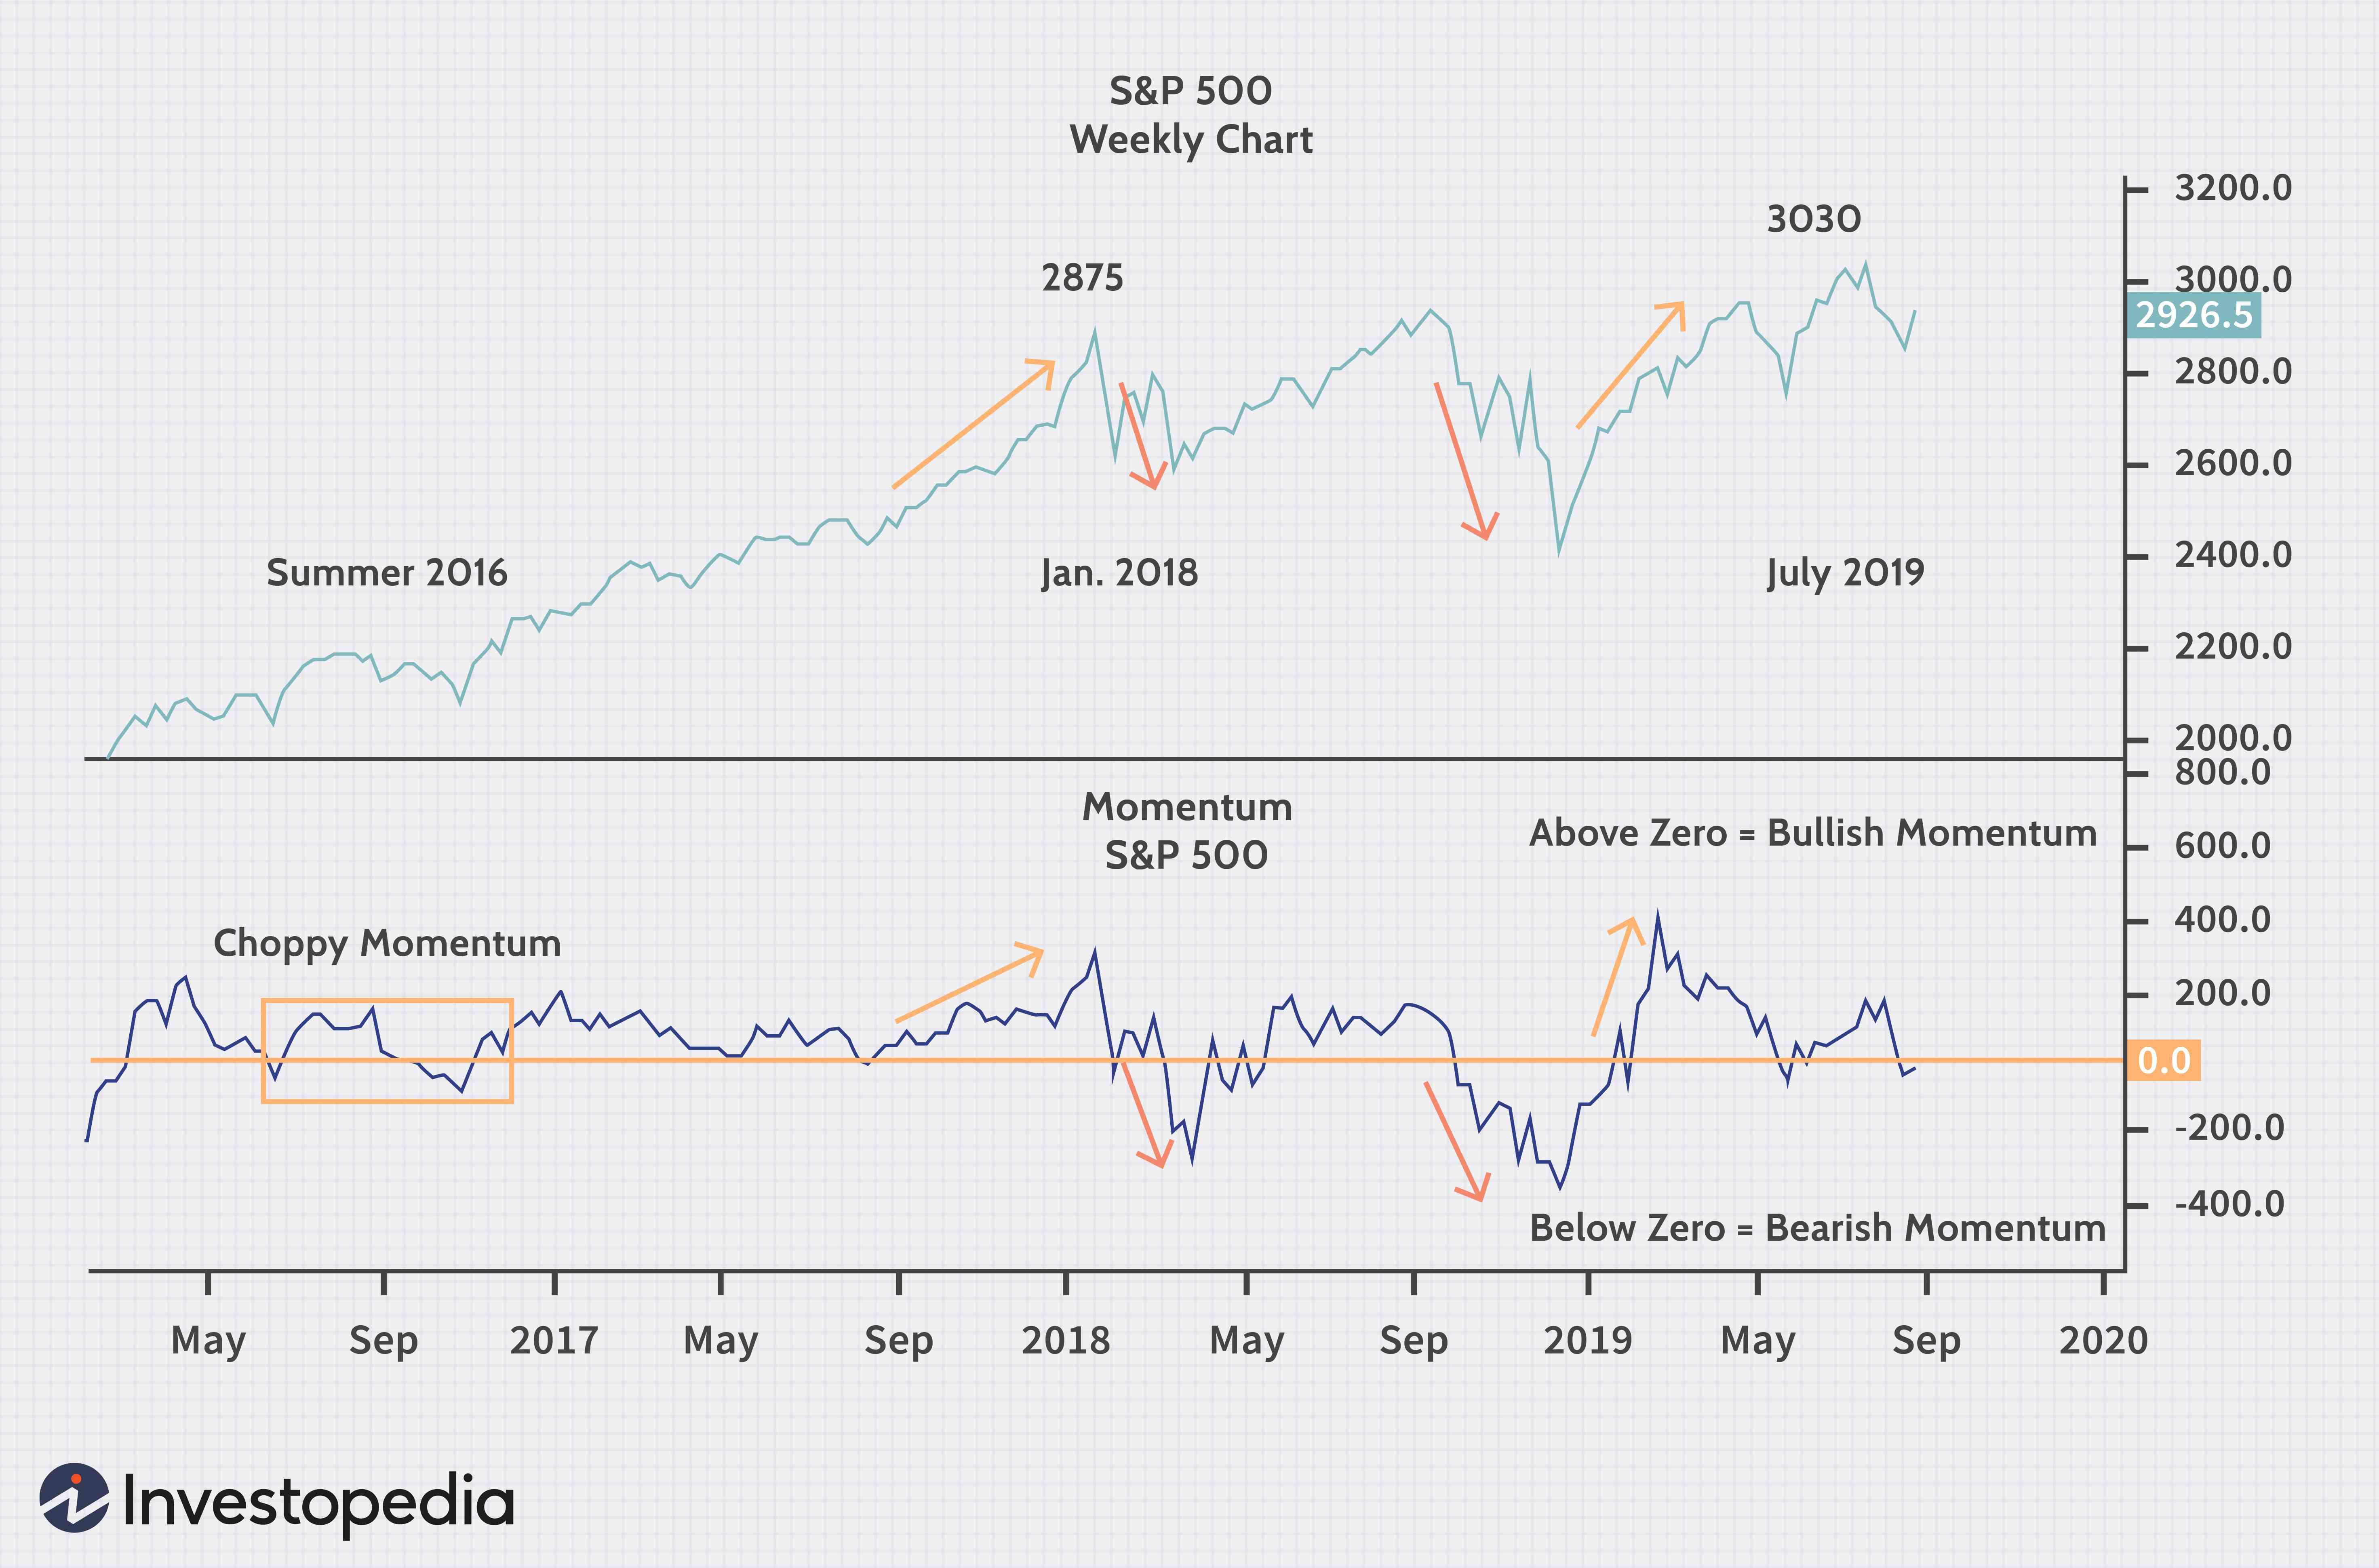 Momentum Indicates Stock Price Strength